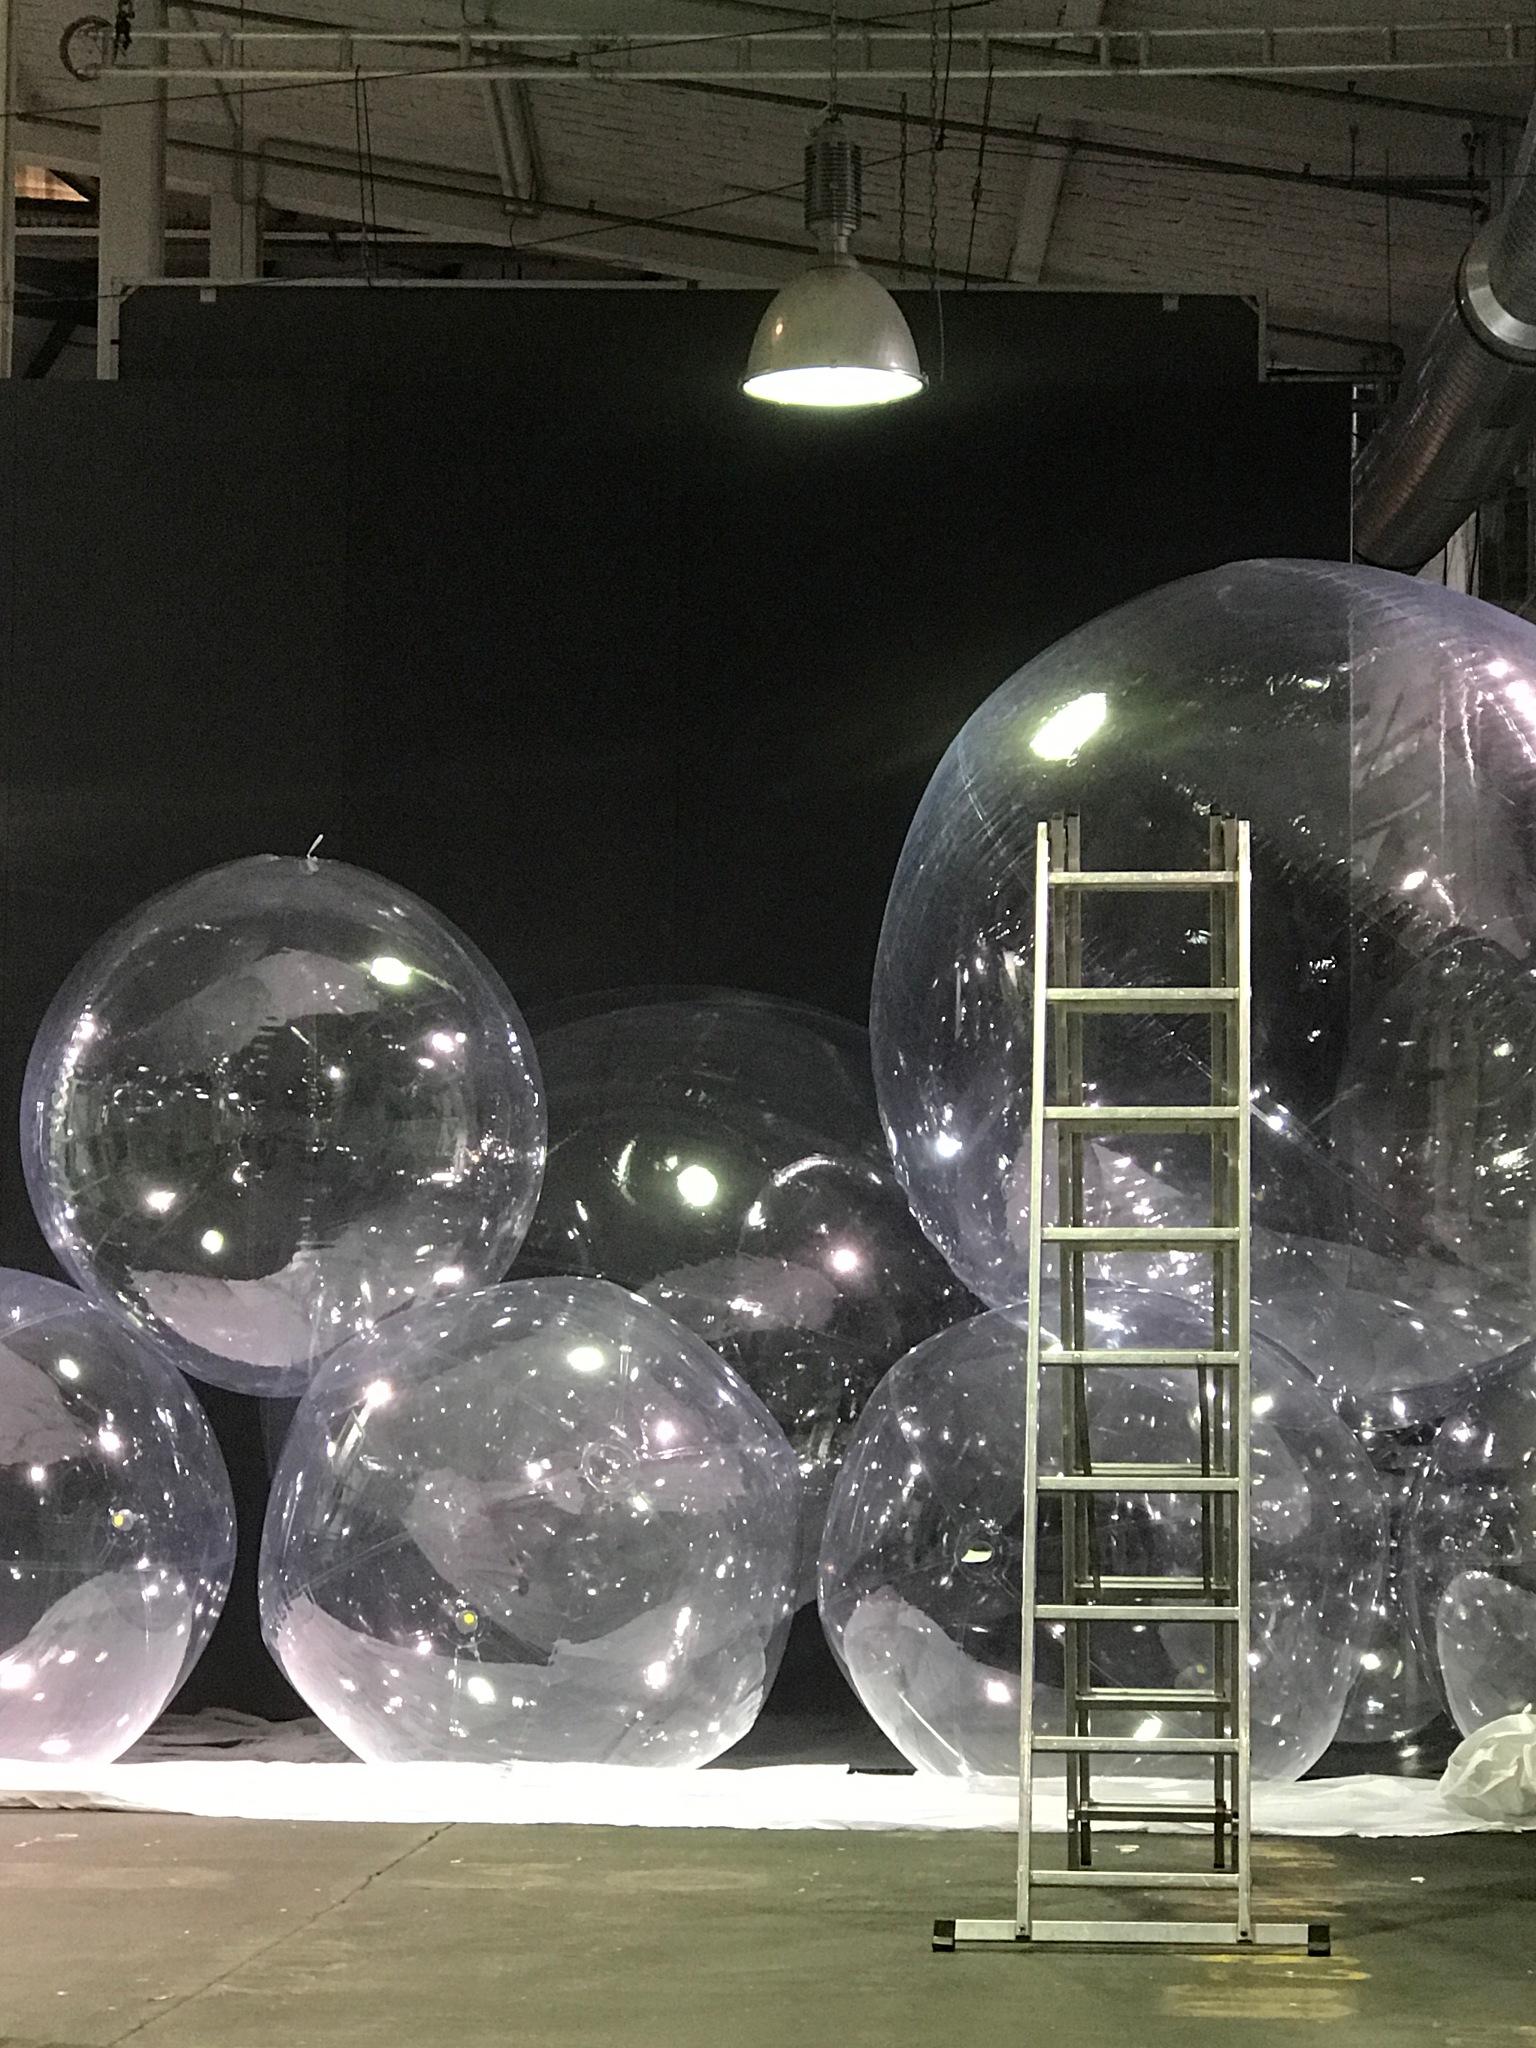 Climb my Filterbubble by Servicekomplizin